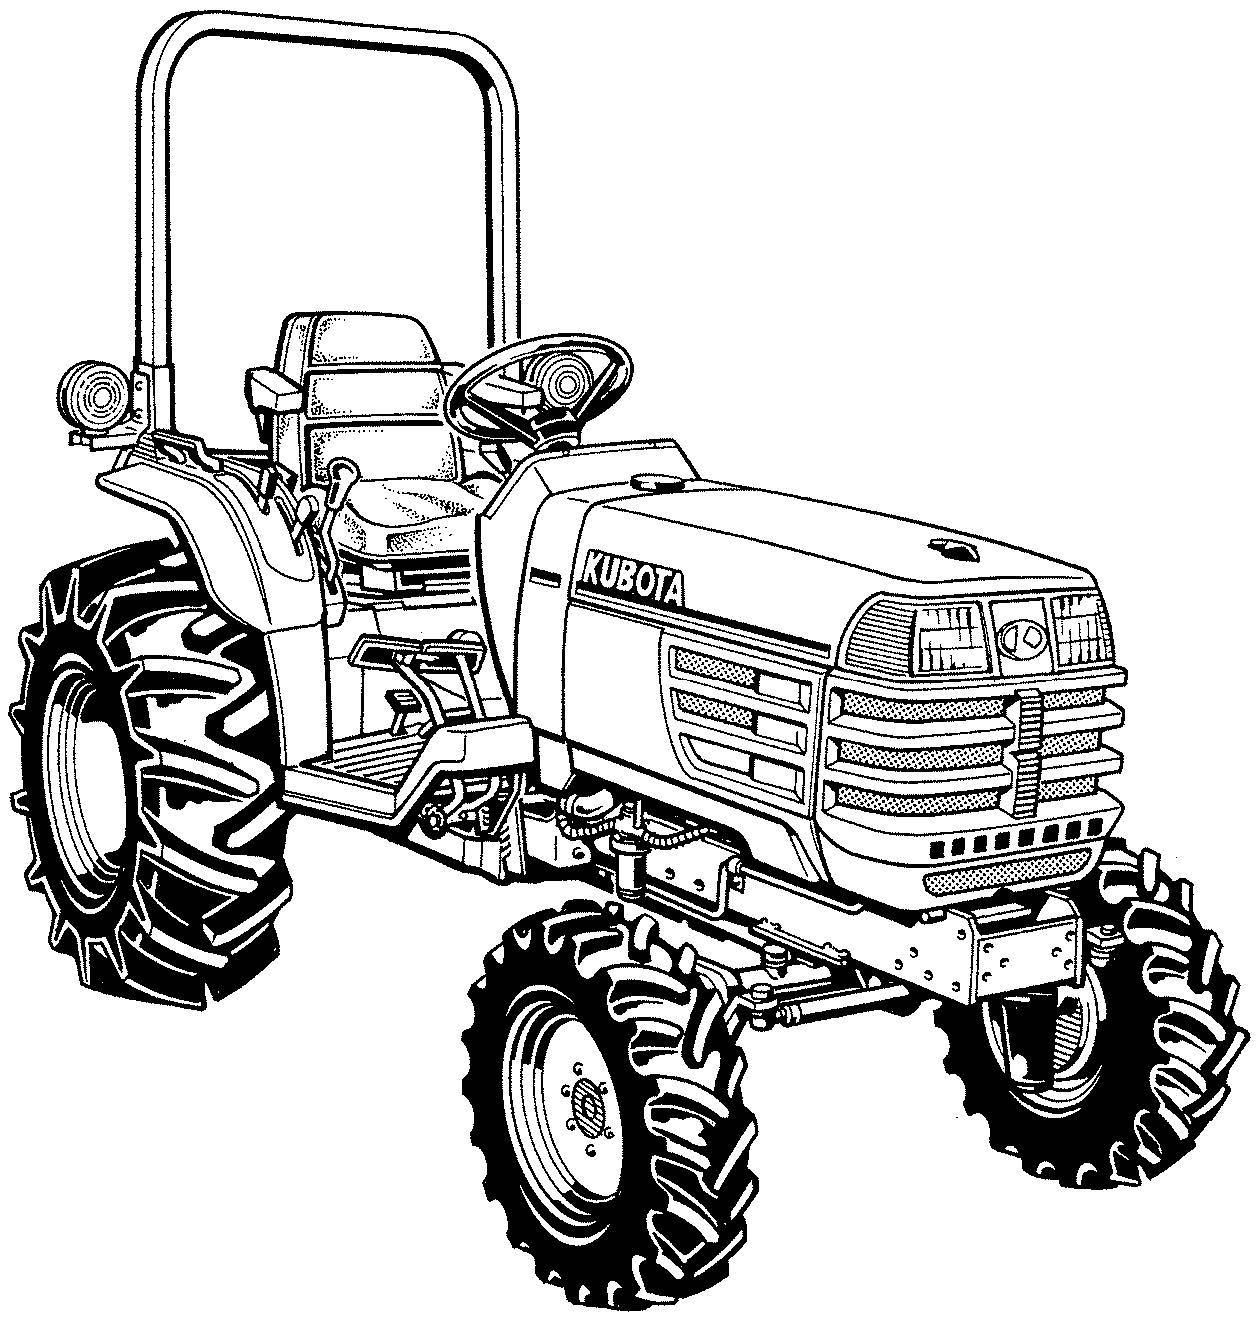 kubota b2410 b2710 b2910 tractors workshop manual down rh sellfy com